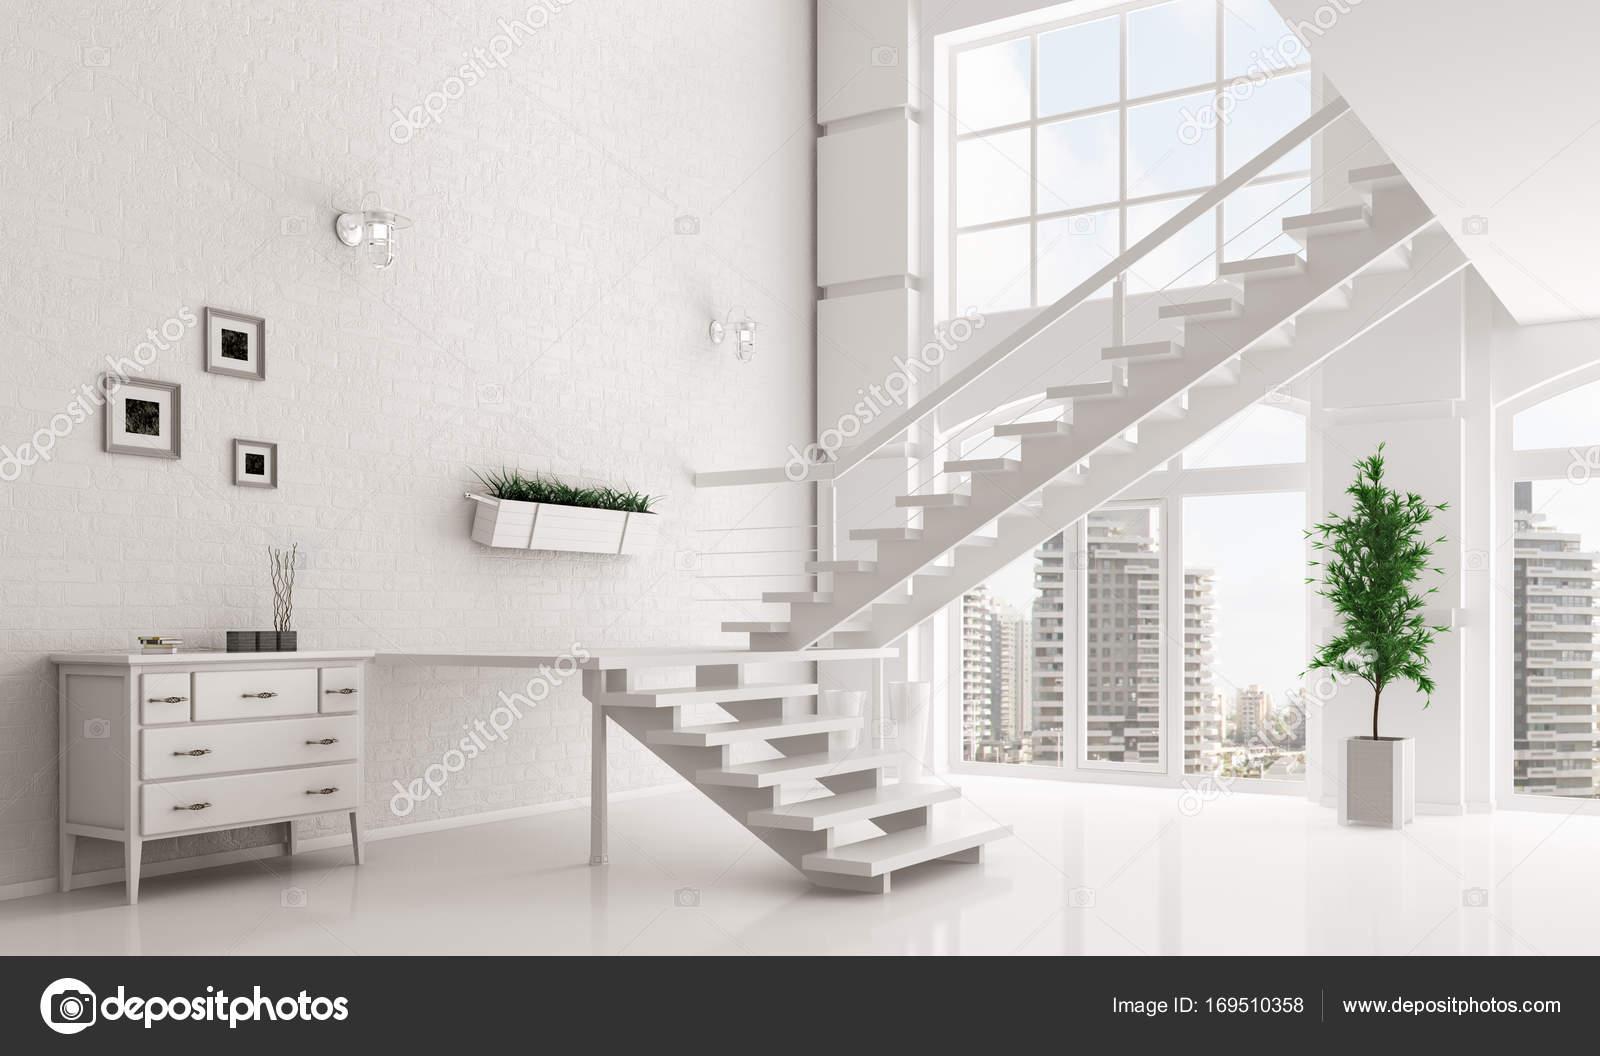 wei e halle mit treppe innen 3d rendering stockfoto scovad 169510358. Black Bedroom Furniture Sets. Home Design Ideas